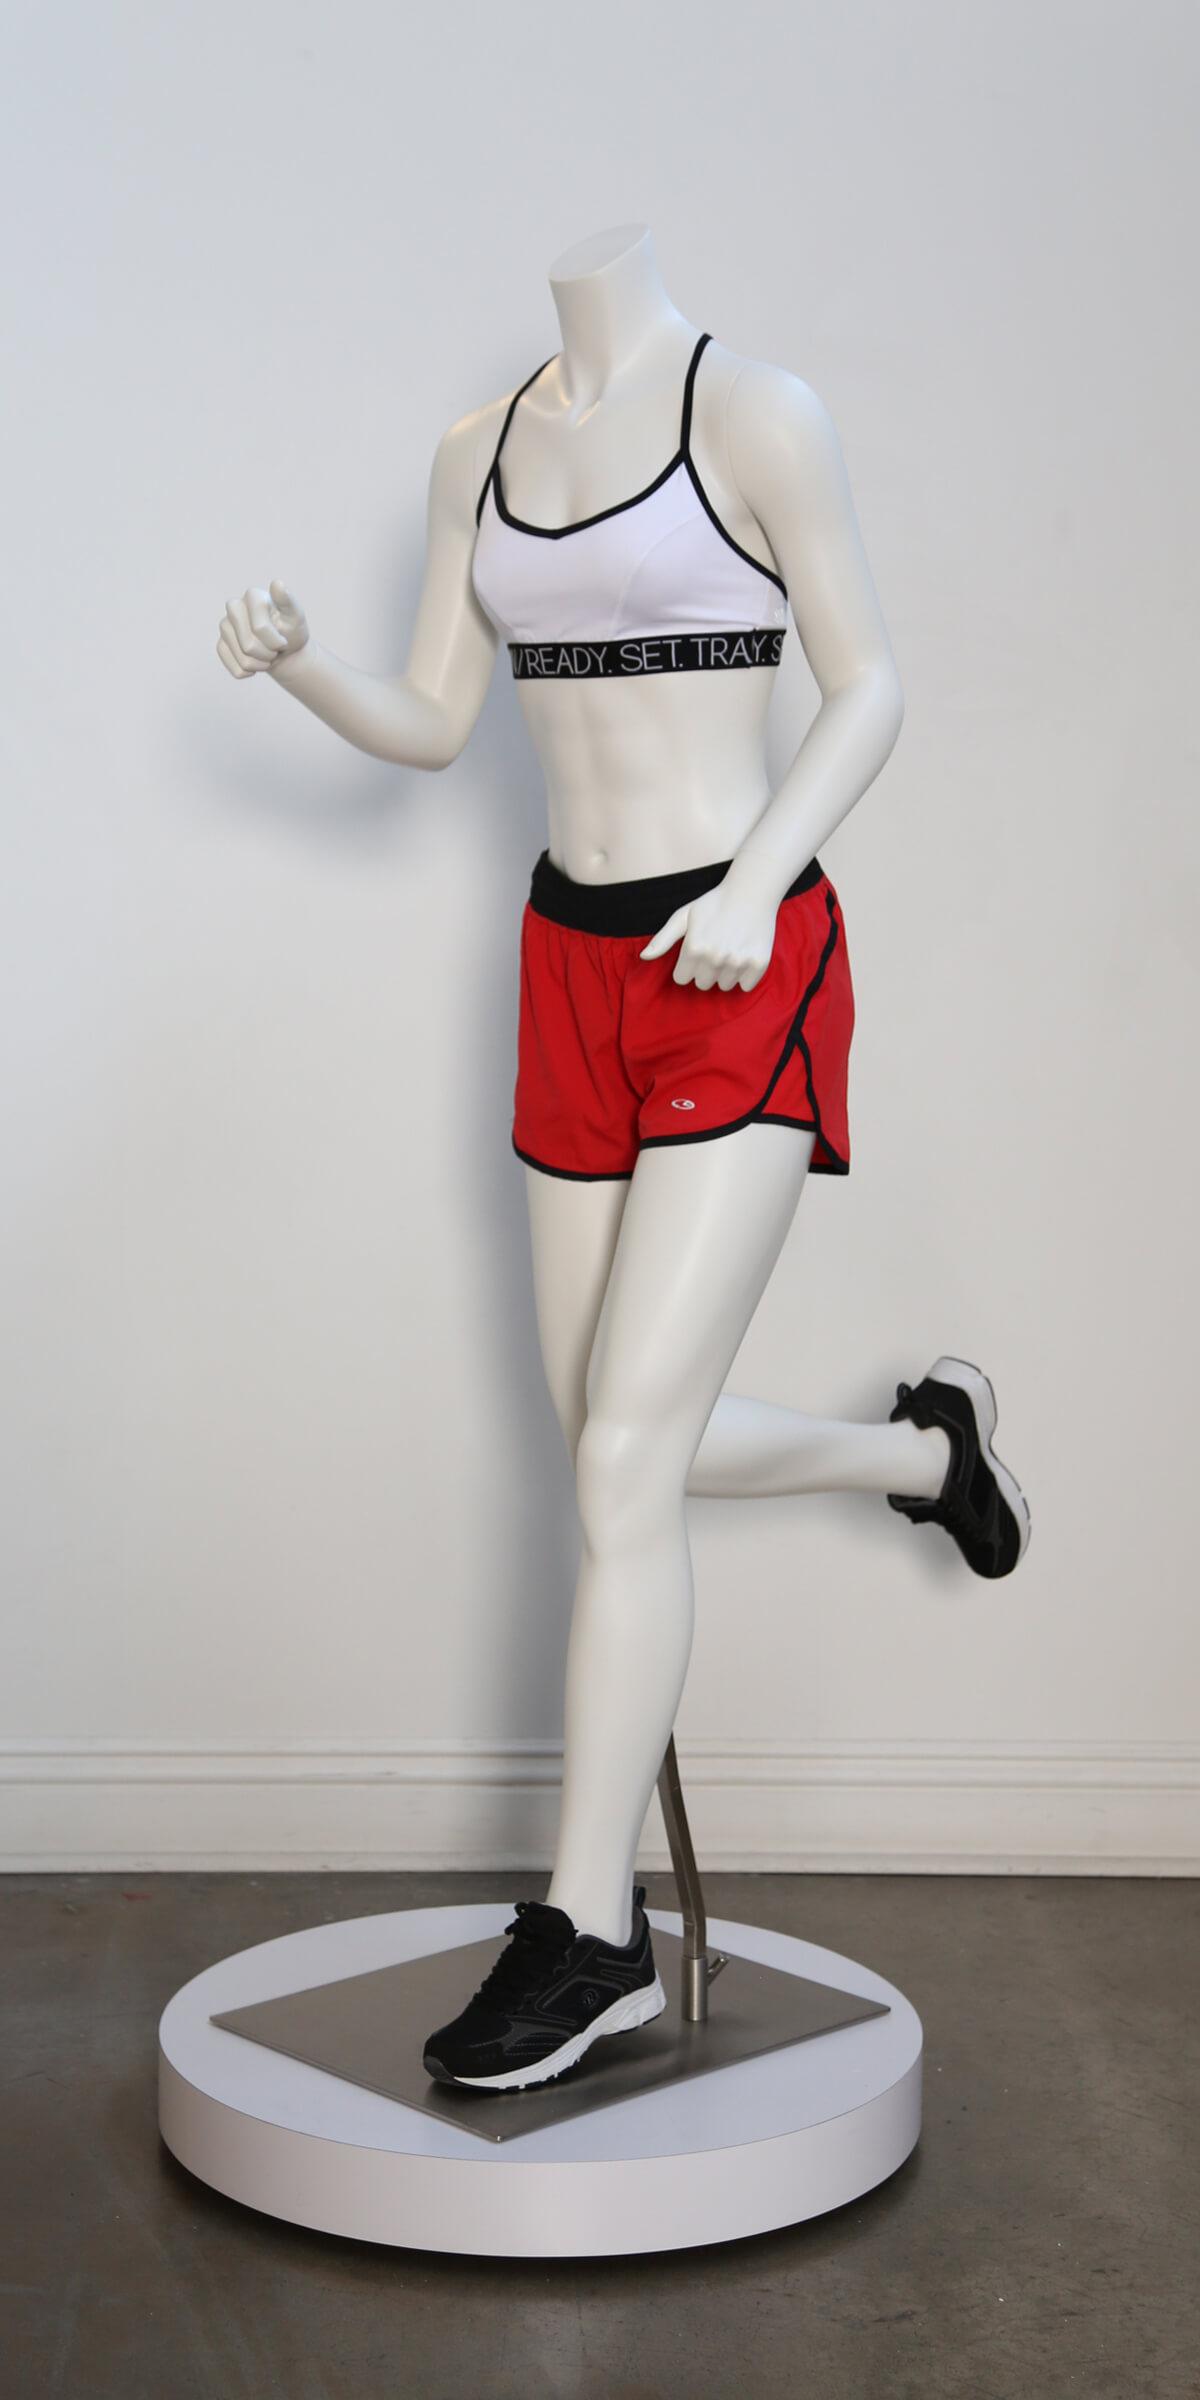 RUN-F1 Dressed